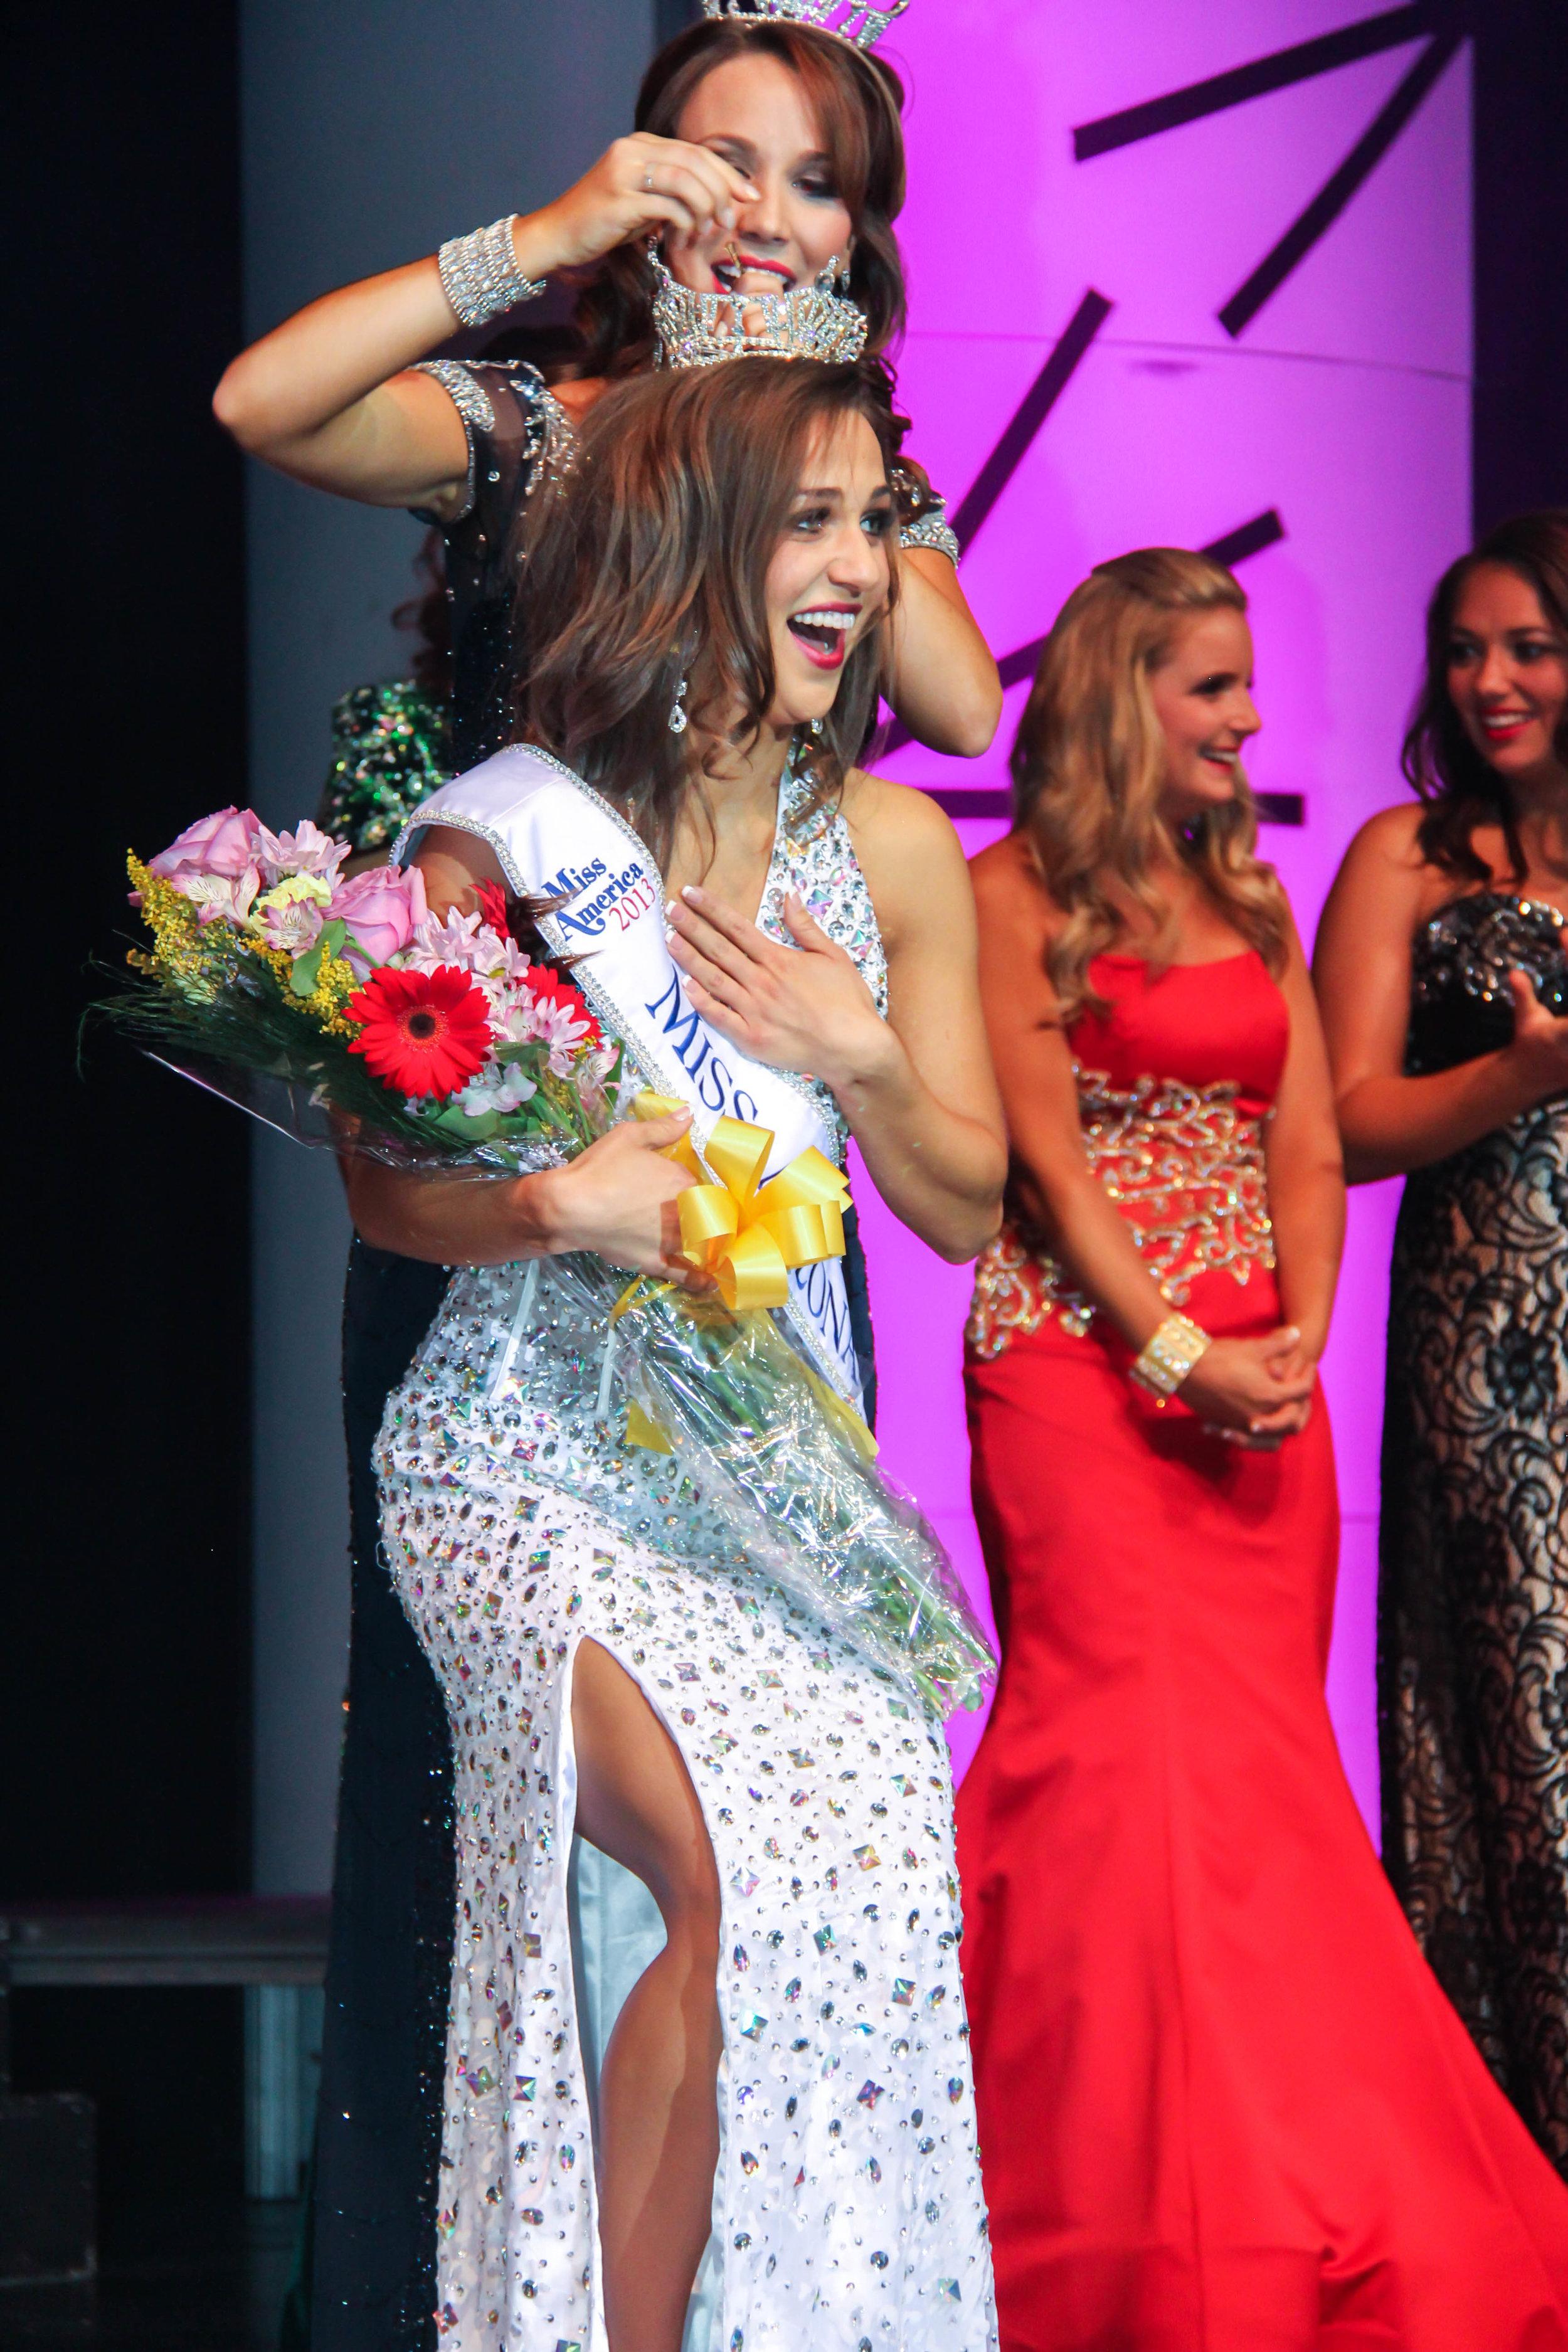 Miss Arizona 2013